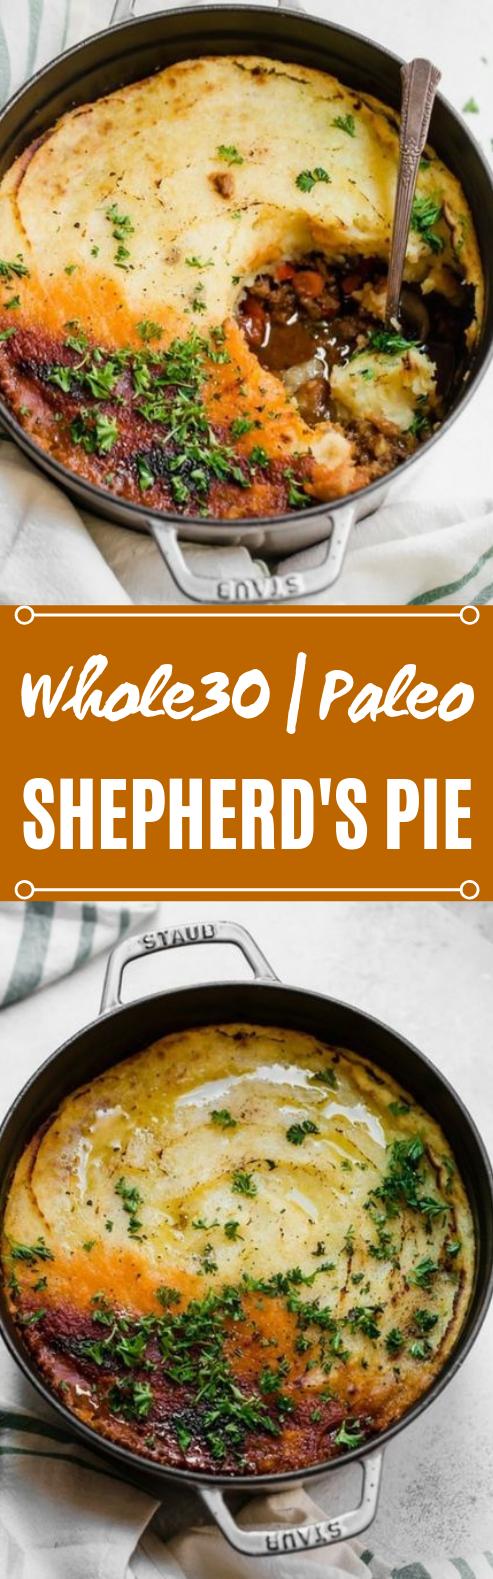 Whole30 Paleo Shepherd's Pie #healthy #recipes